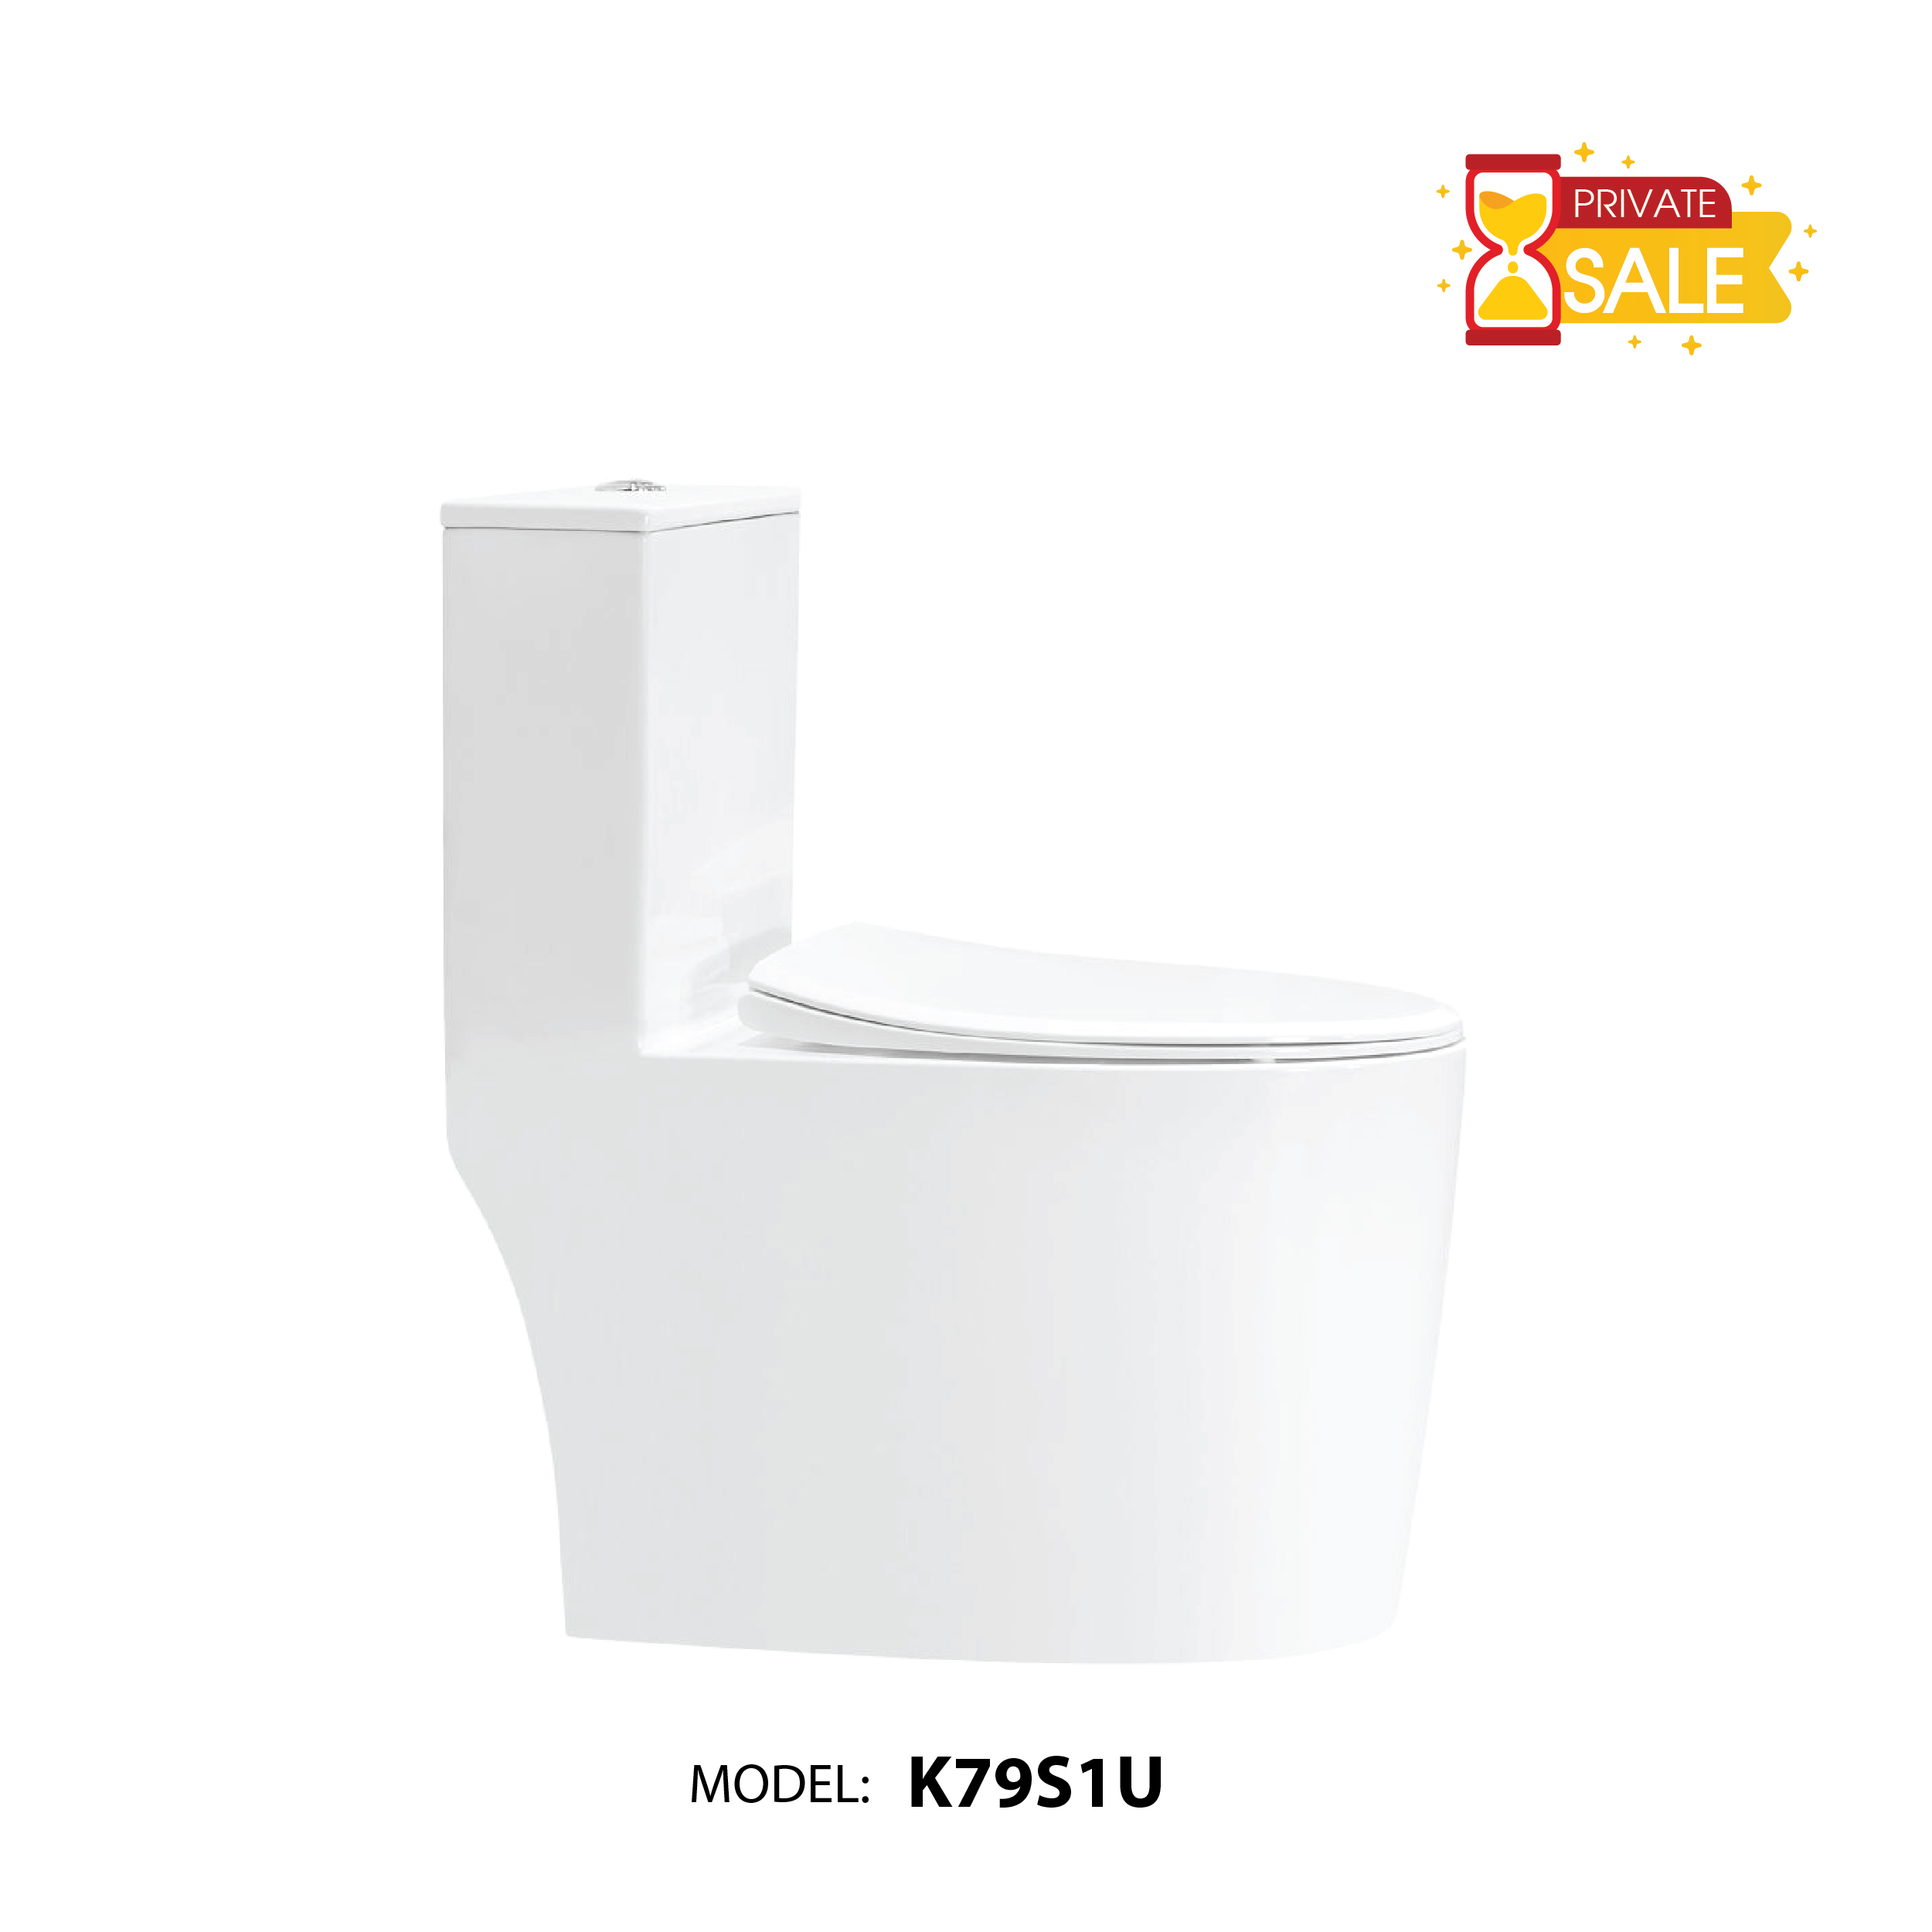 BỒN CẦU CARANO 1 KHỐI K79S1U (TOILET MODEL: K79S1U).